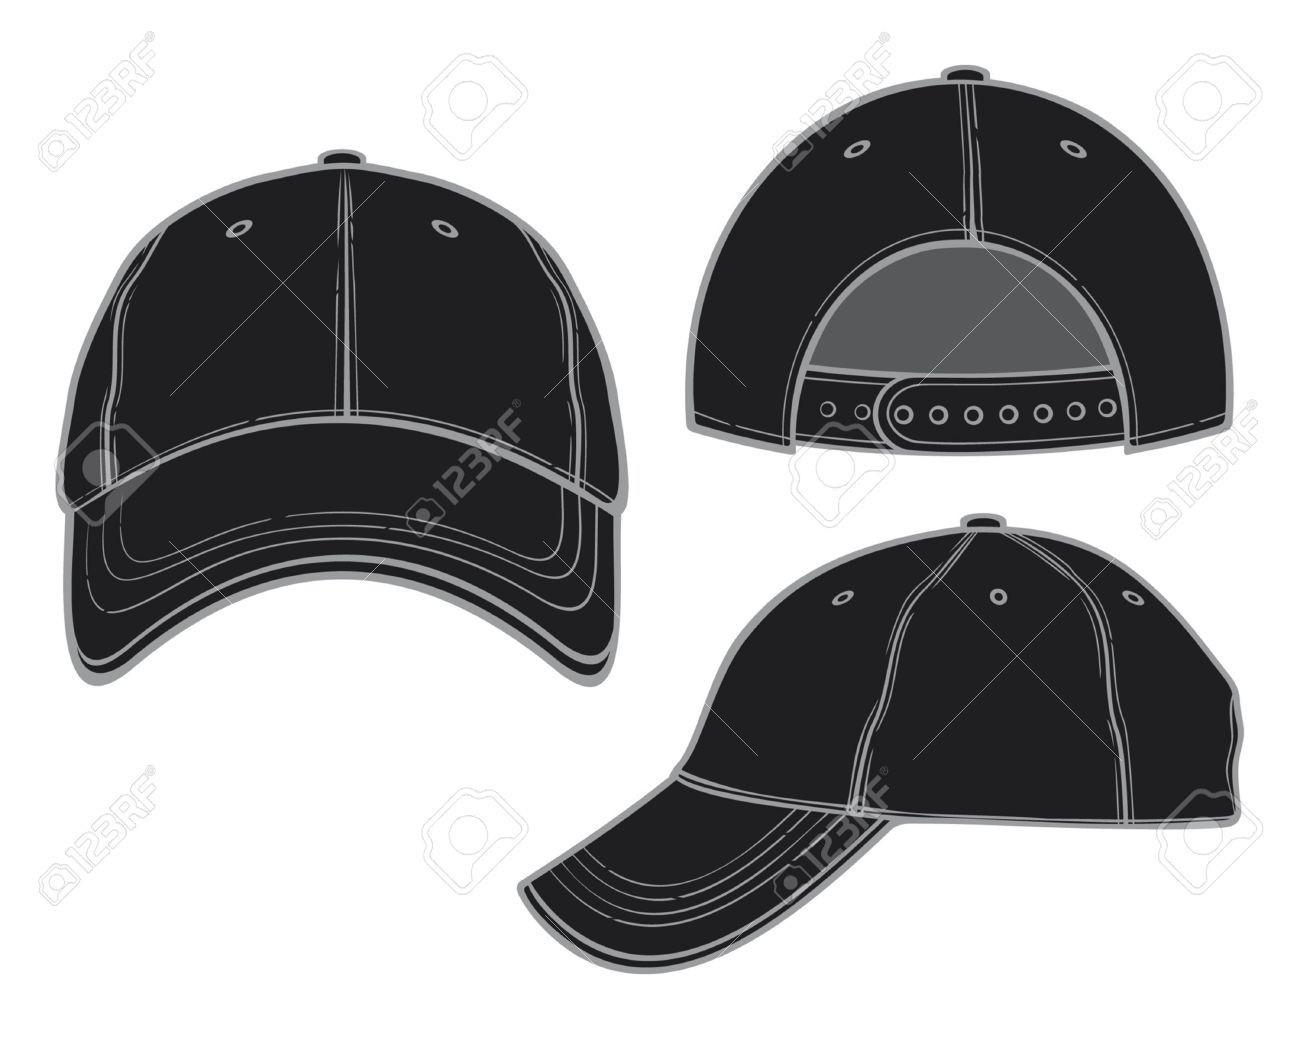 Backwards baseball cap cap clipart backwards hat pencil and in color.